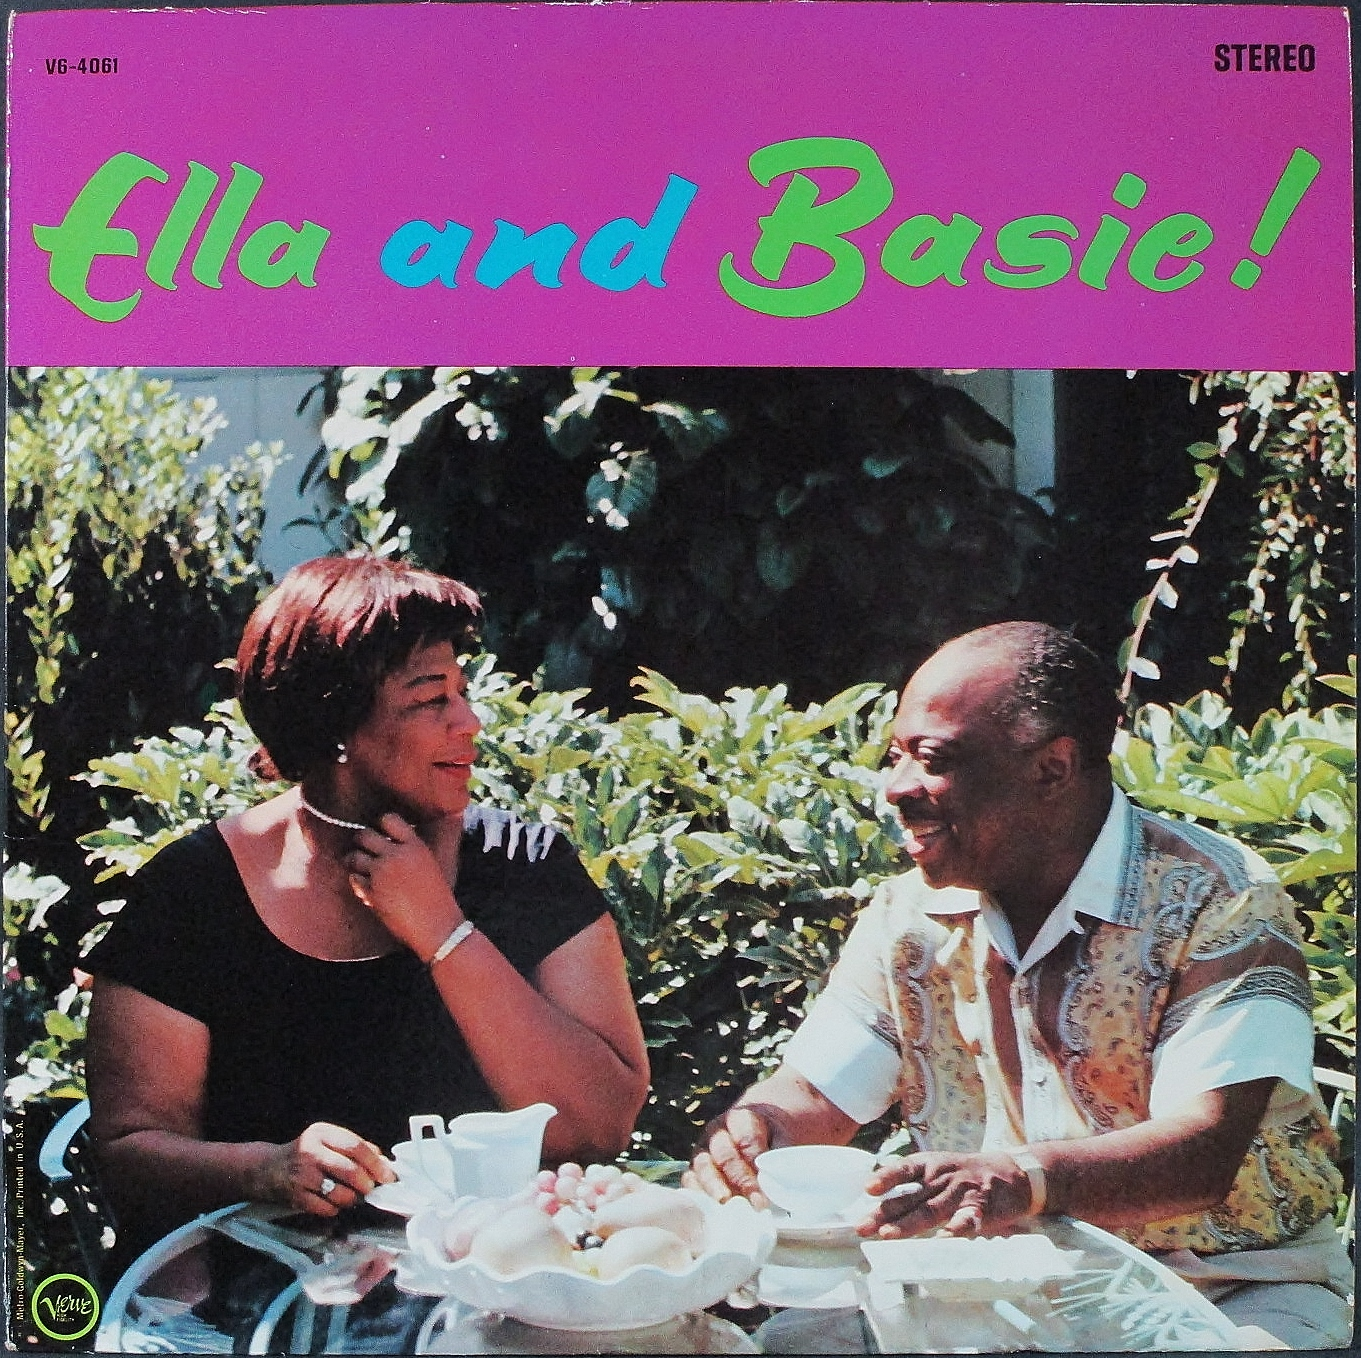 Count Basie - Ella Fitzgerald カウント・ベイシー、エラ・フィッツジェラルド / Ella And Basie!